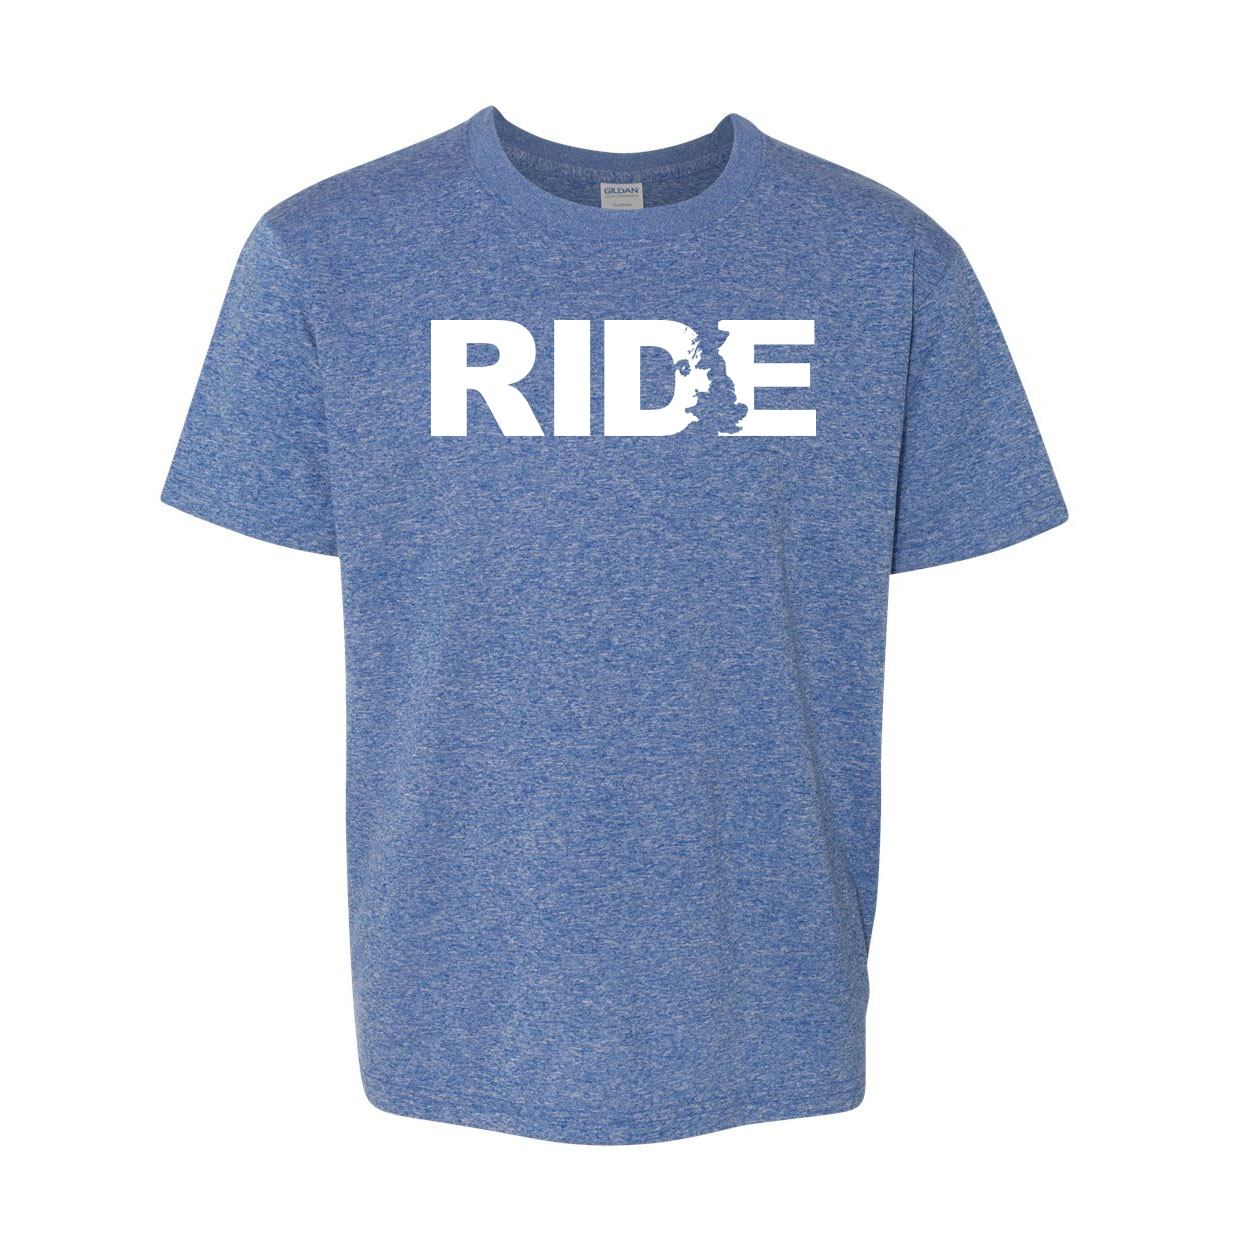 Ride United Kingdom Classic Youth T-Shirt Blue (White Logo)